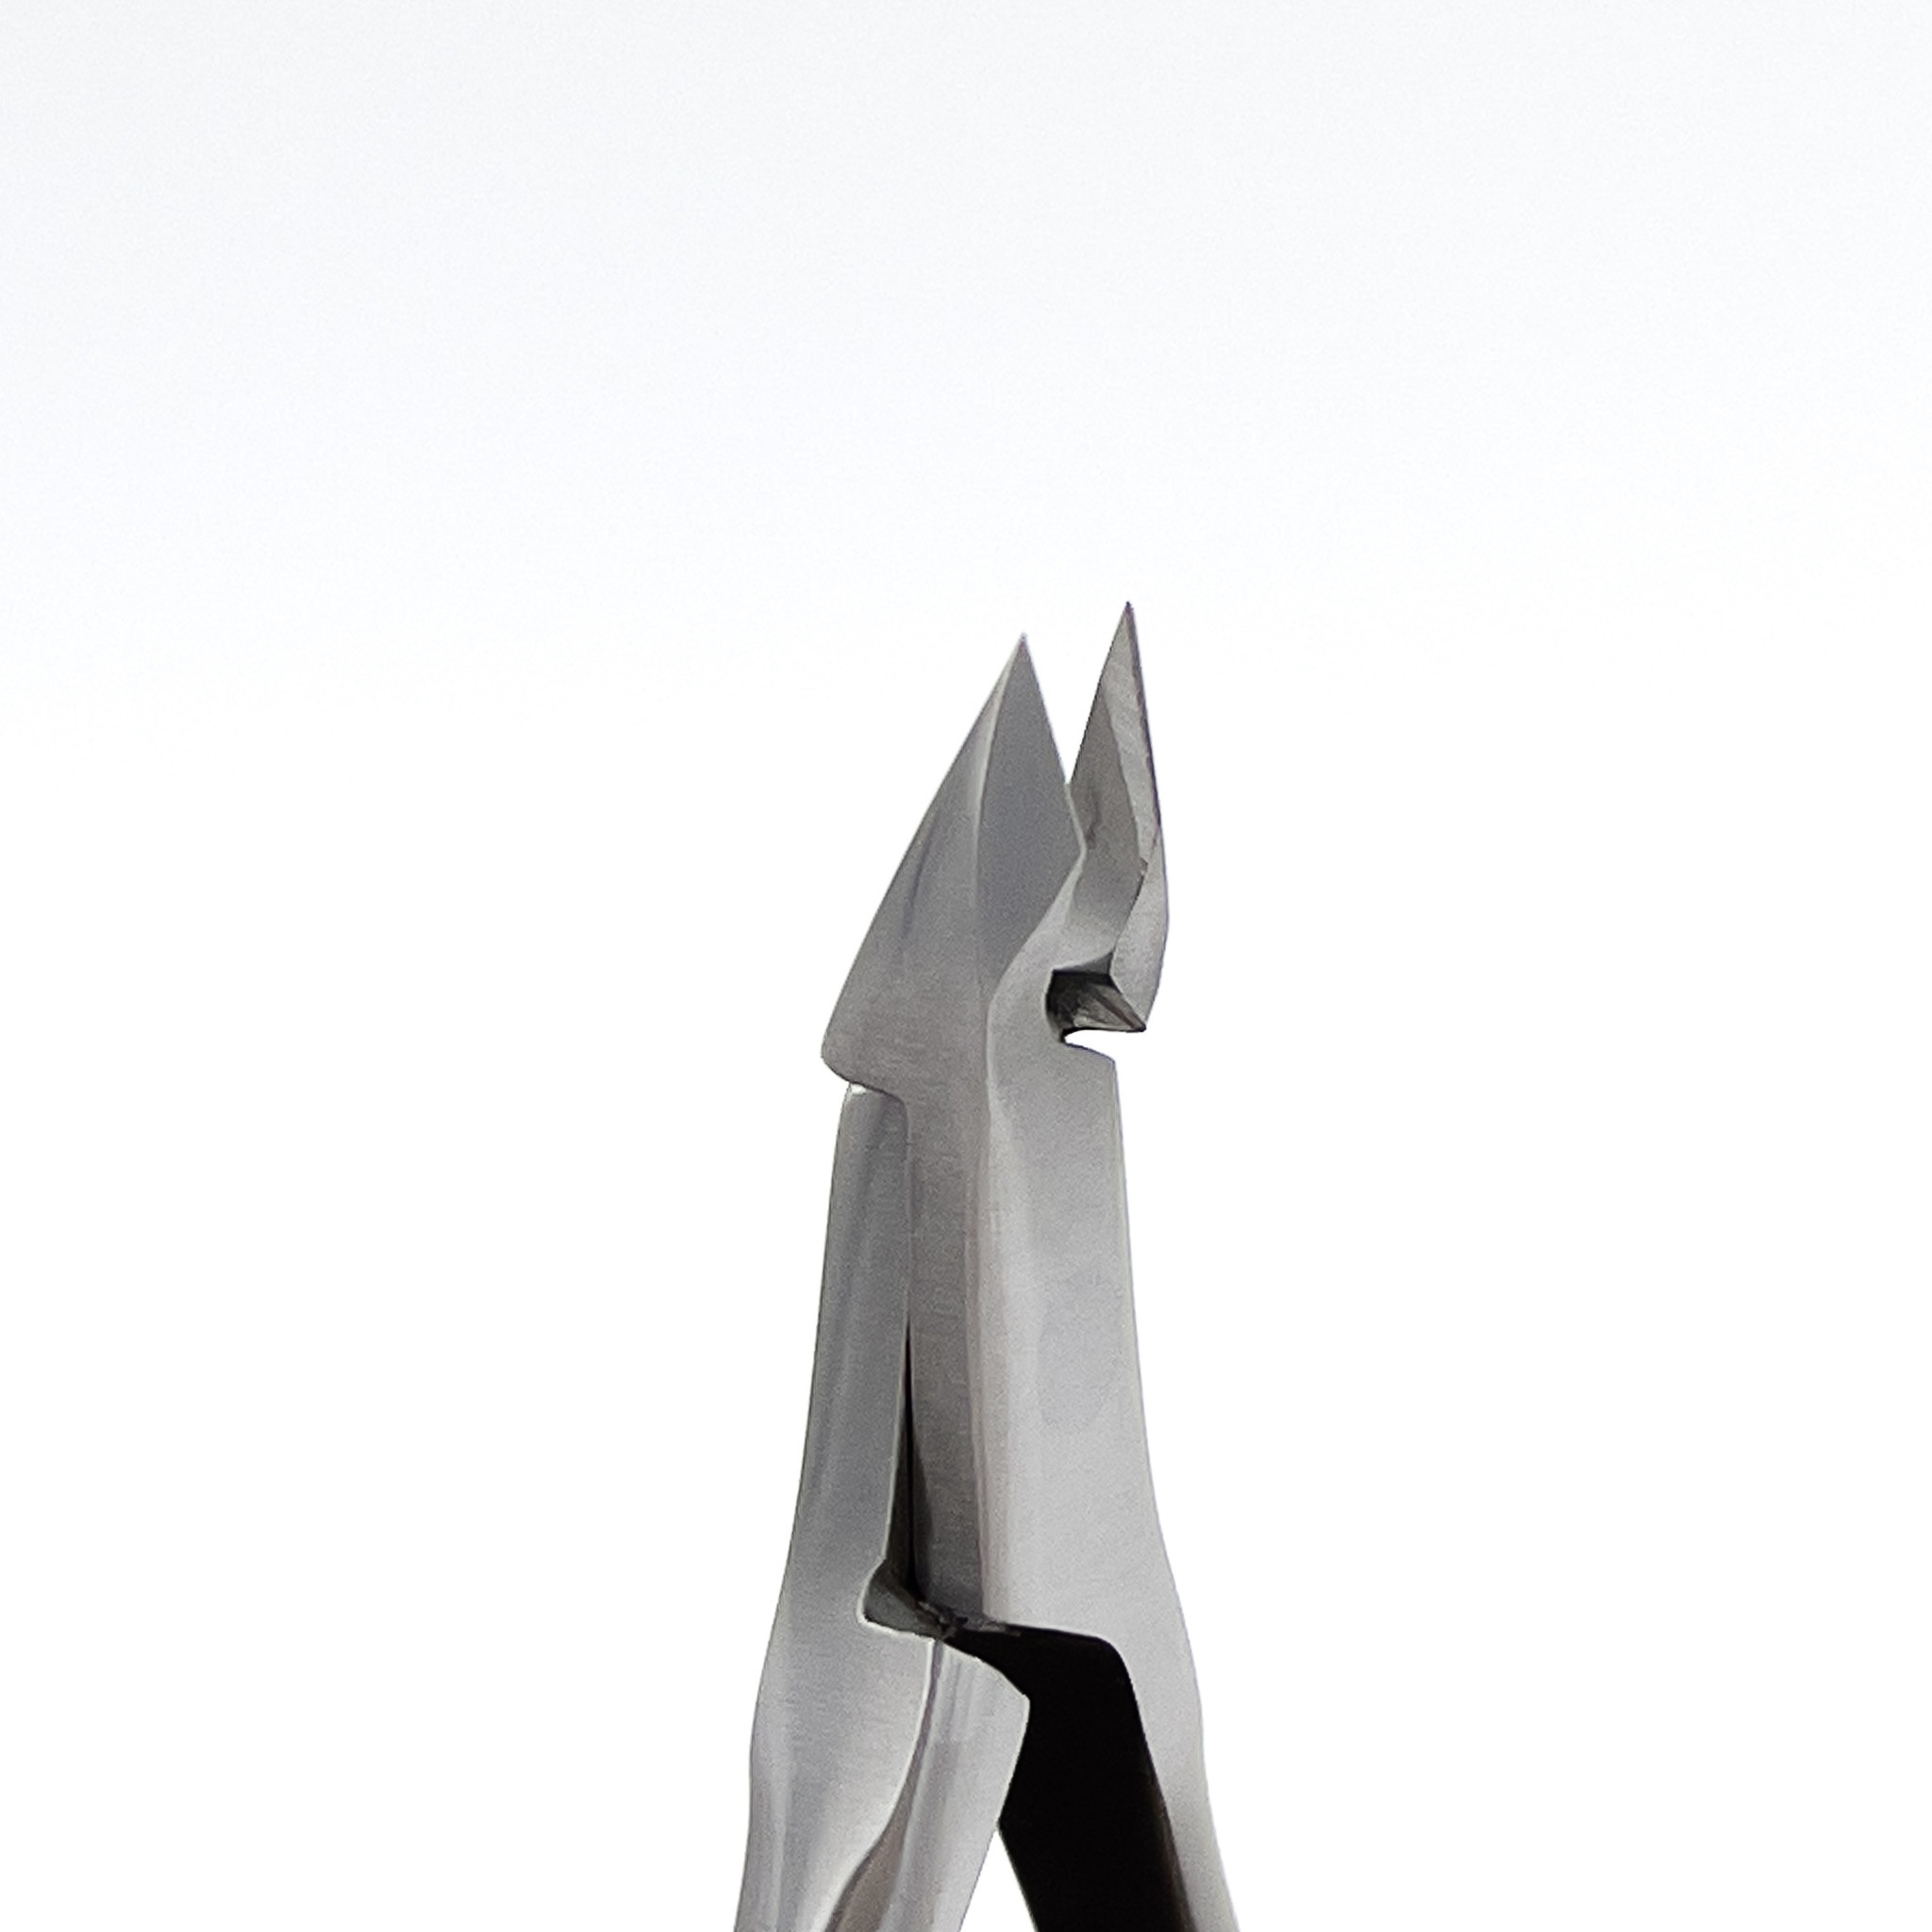 STALENA Vellentang 5 mm - langere handgreep KE-09 (N5-30-05)